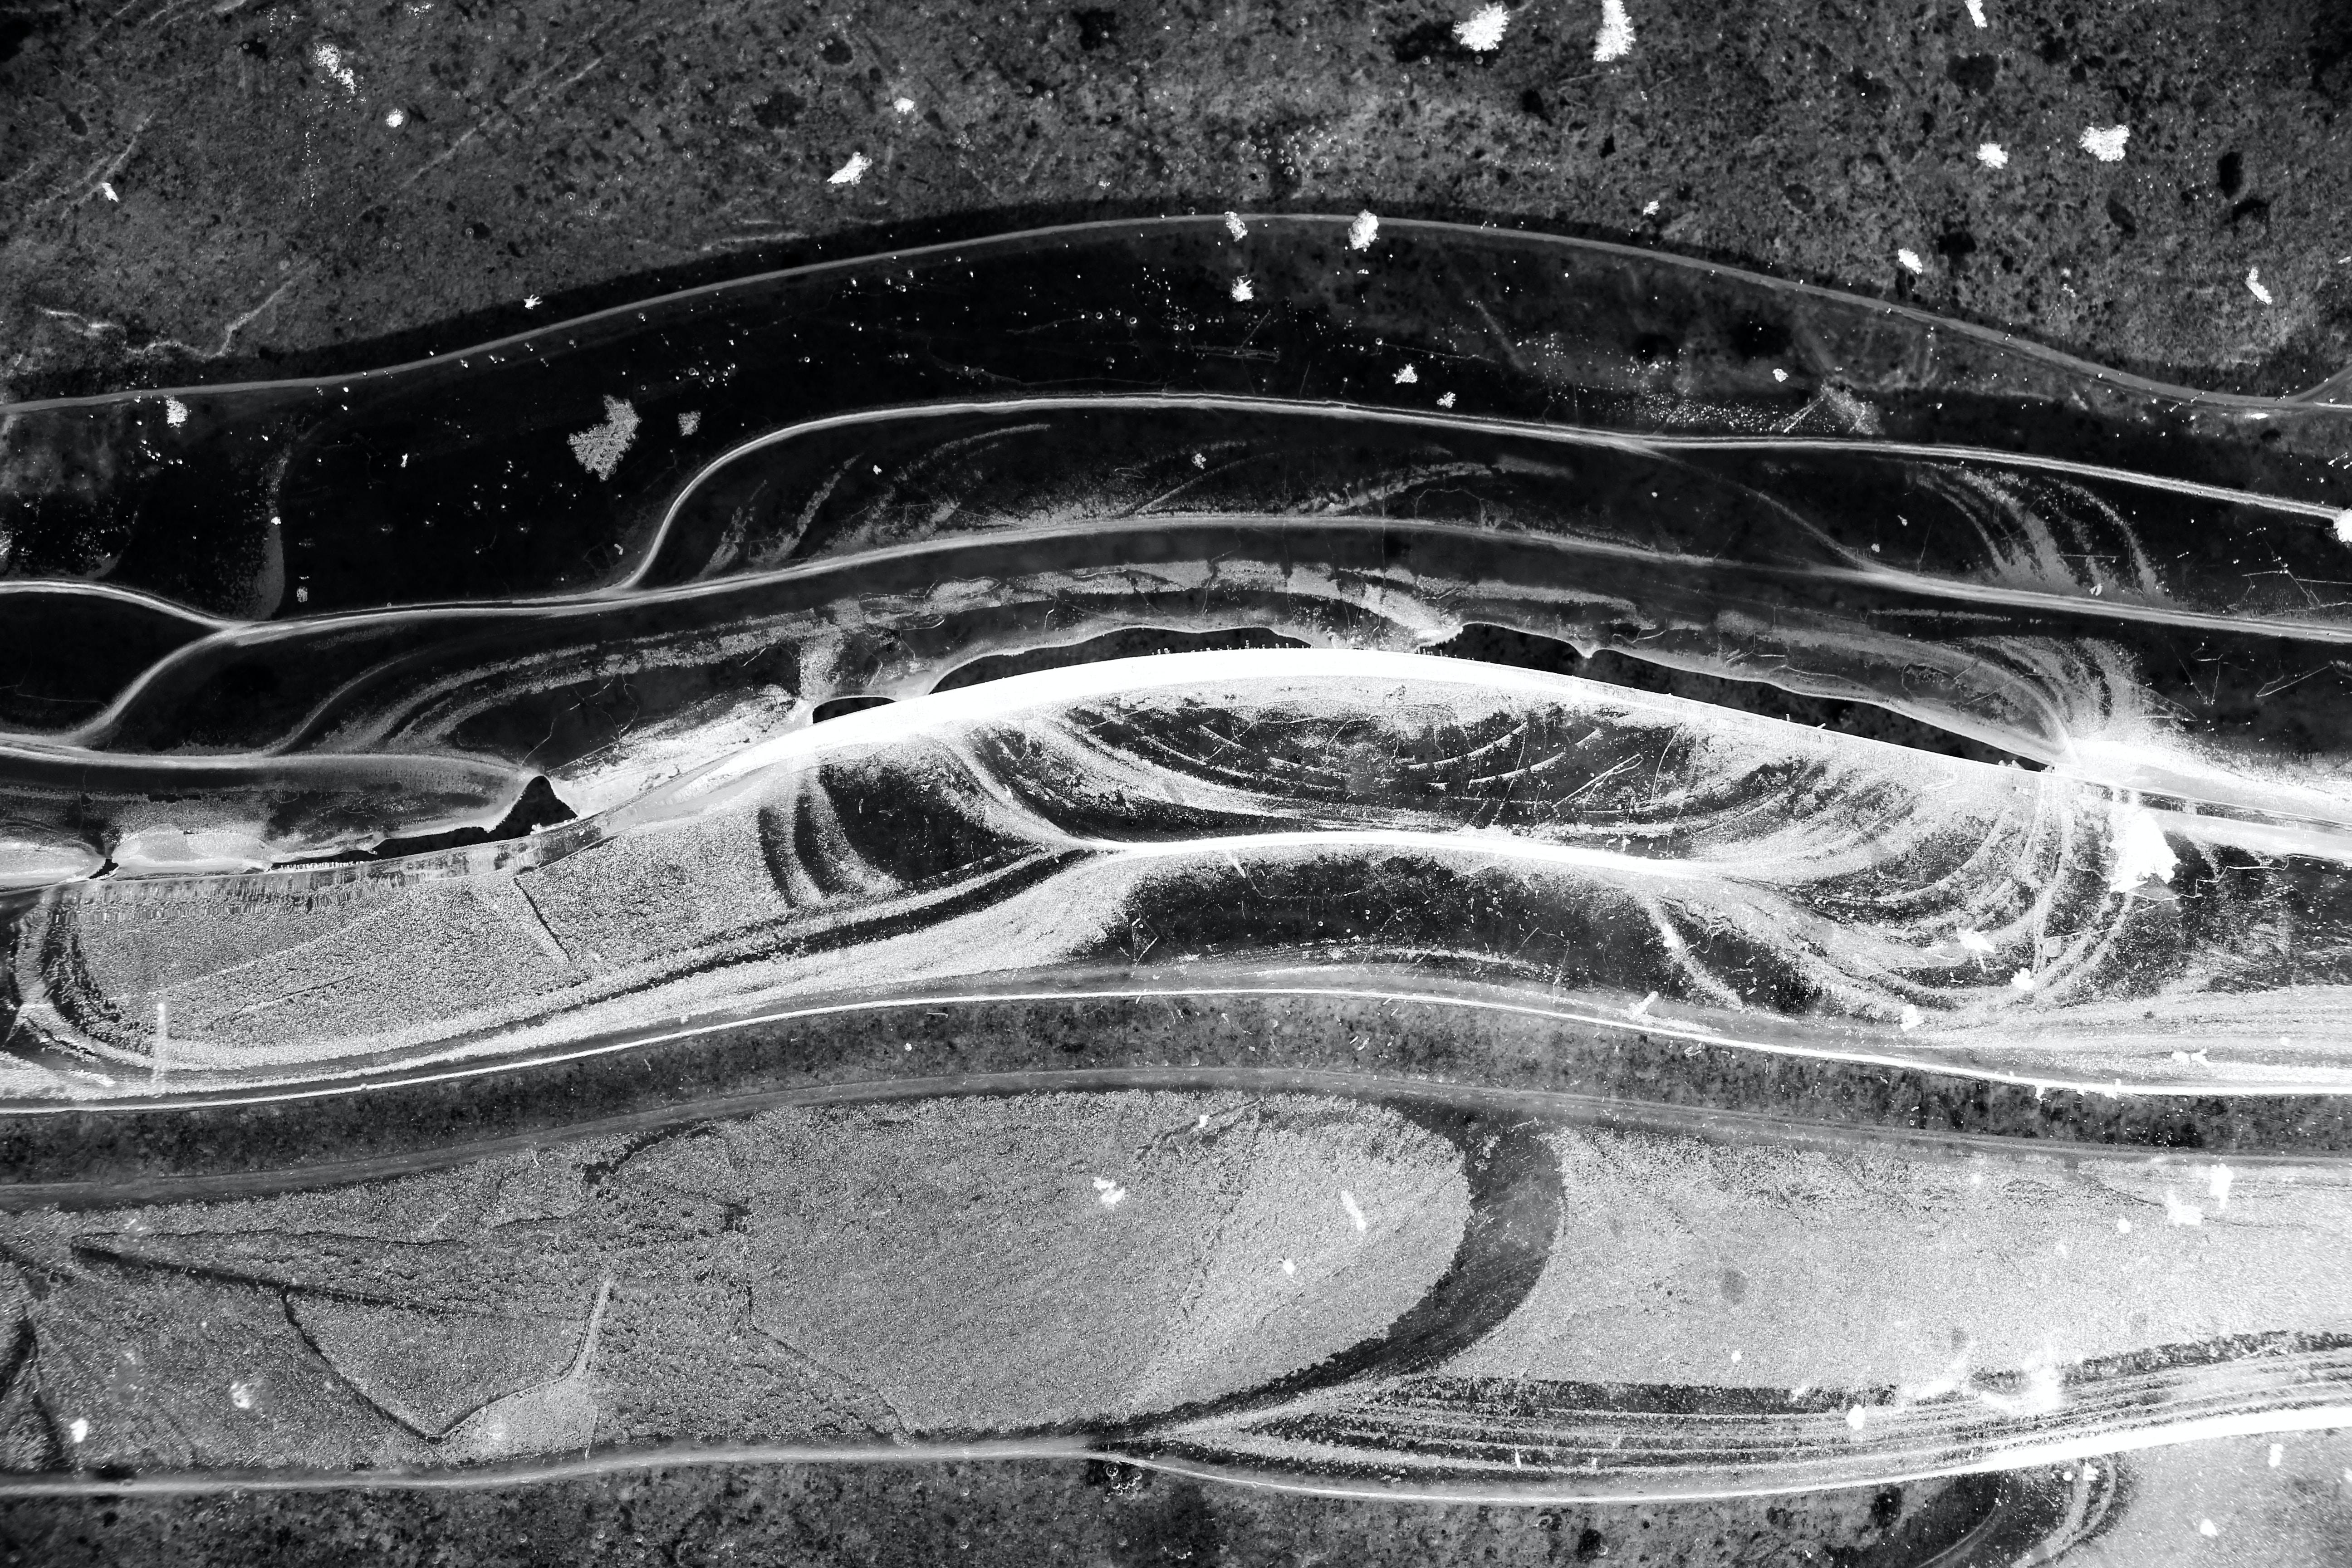 Free Unsplash photo from Jorg Karg